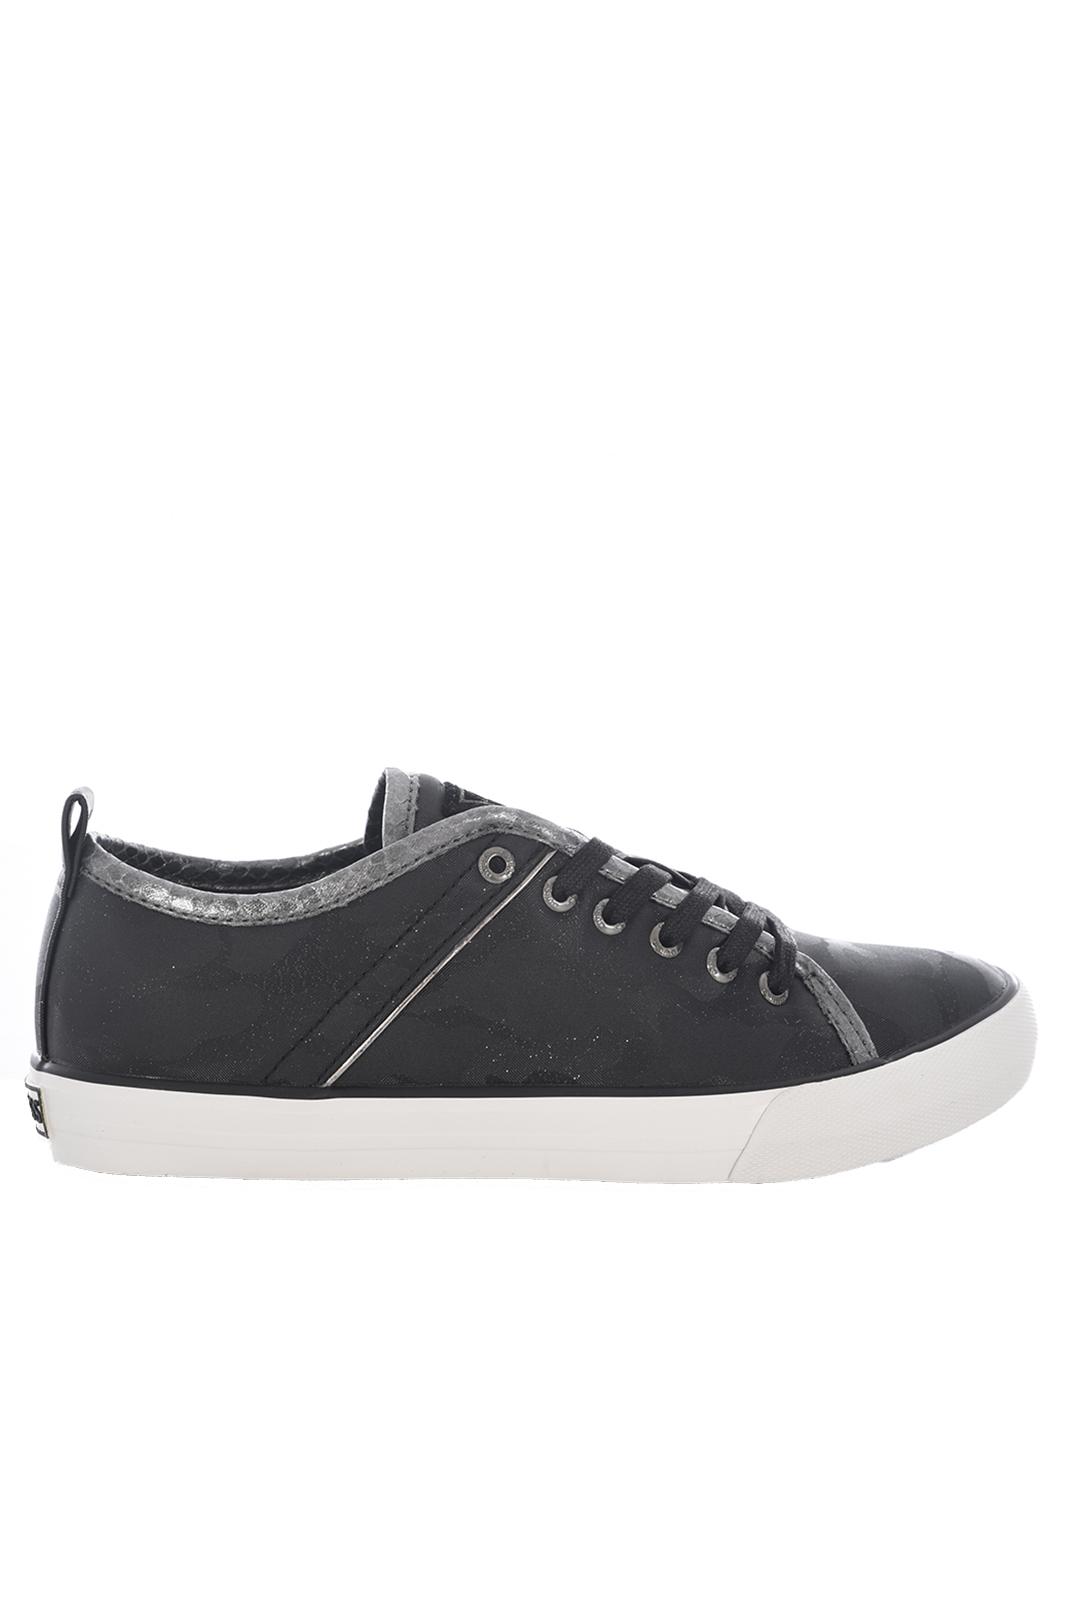 Baskets / Sneakers  Guess jeans JOLIE FLJOI3 FAB12 BLACK